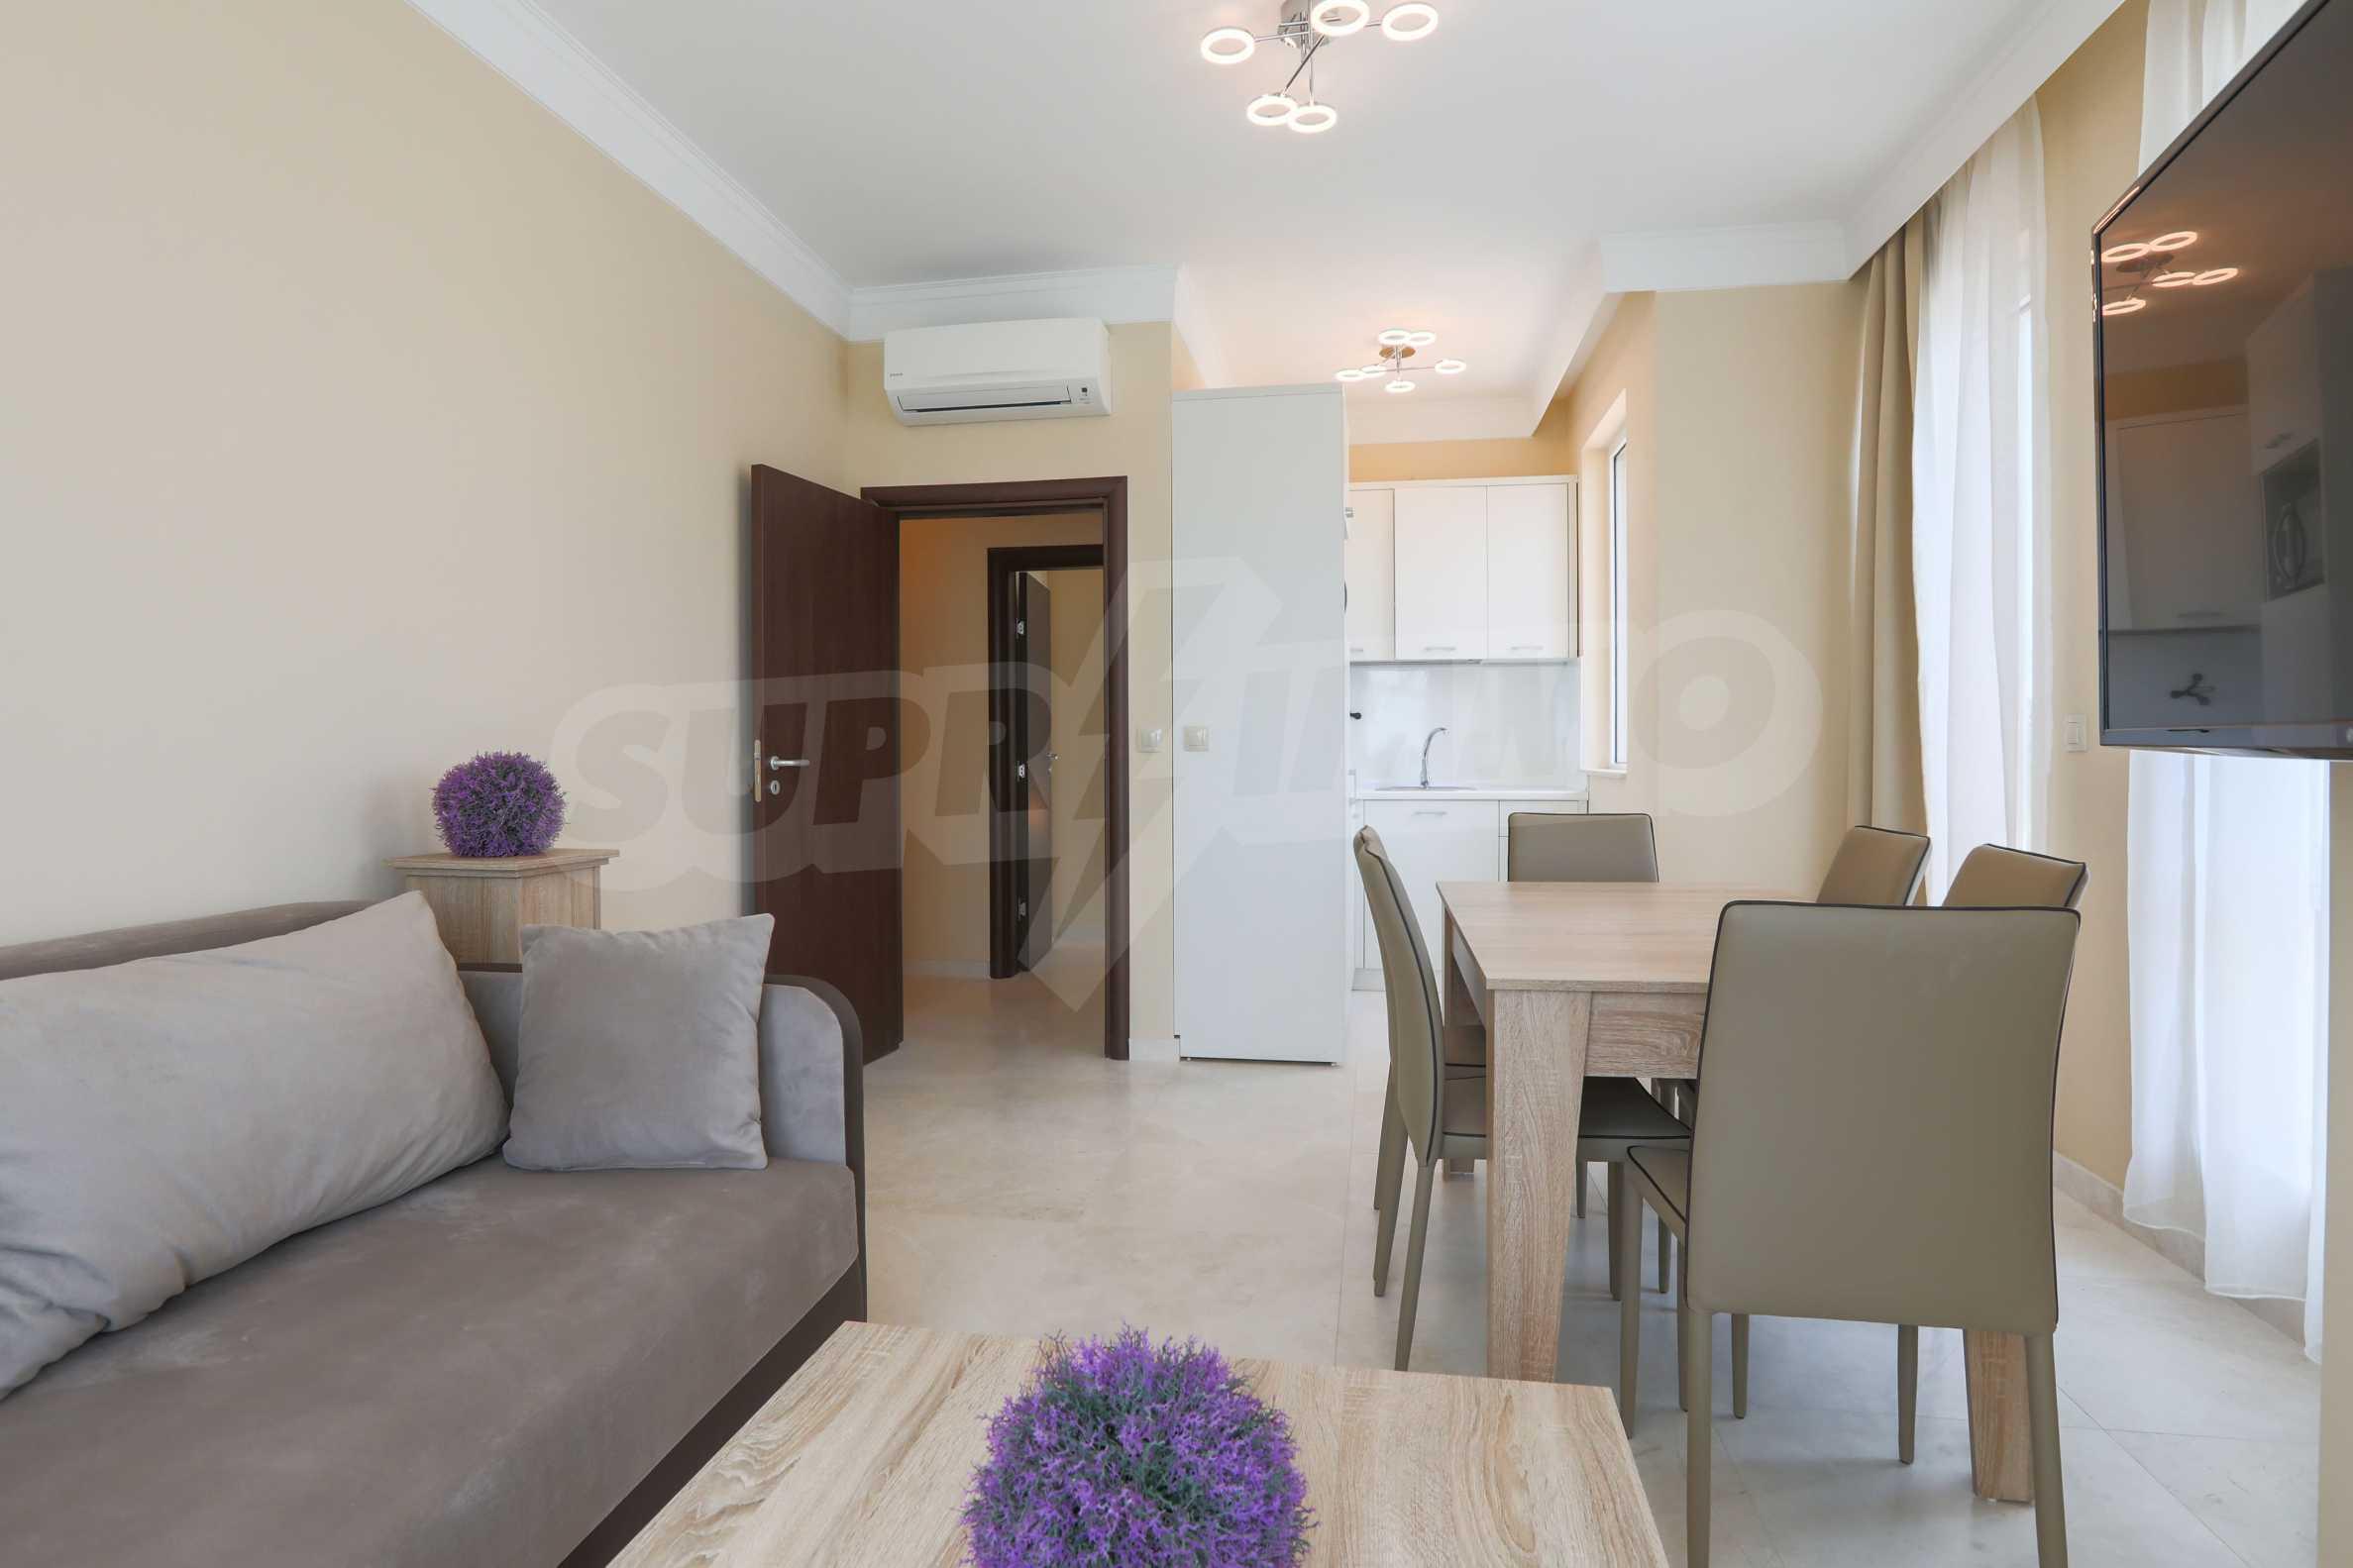 Комфортен двустаен апартамент под наем в Belle Époque Beach Residence, курорт Лозенец 2